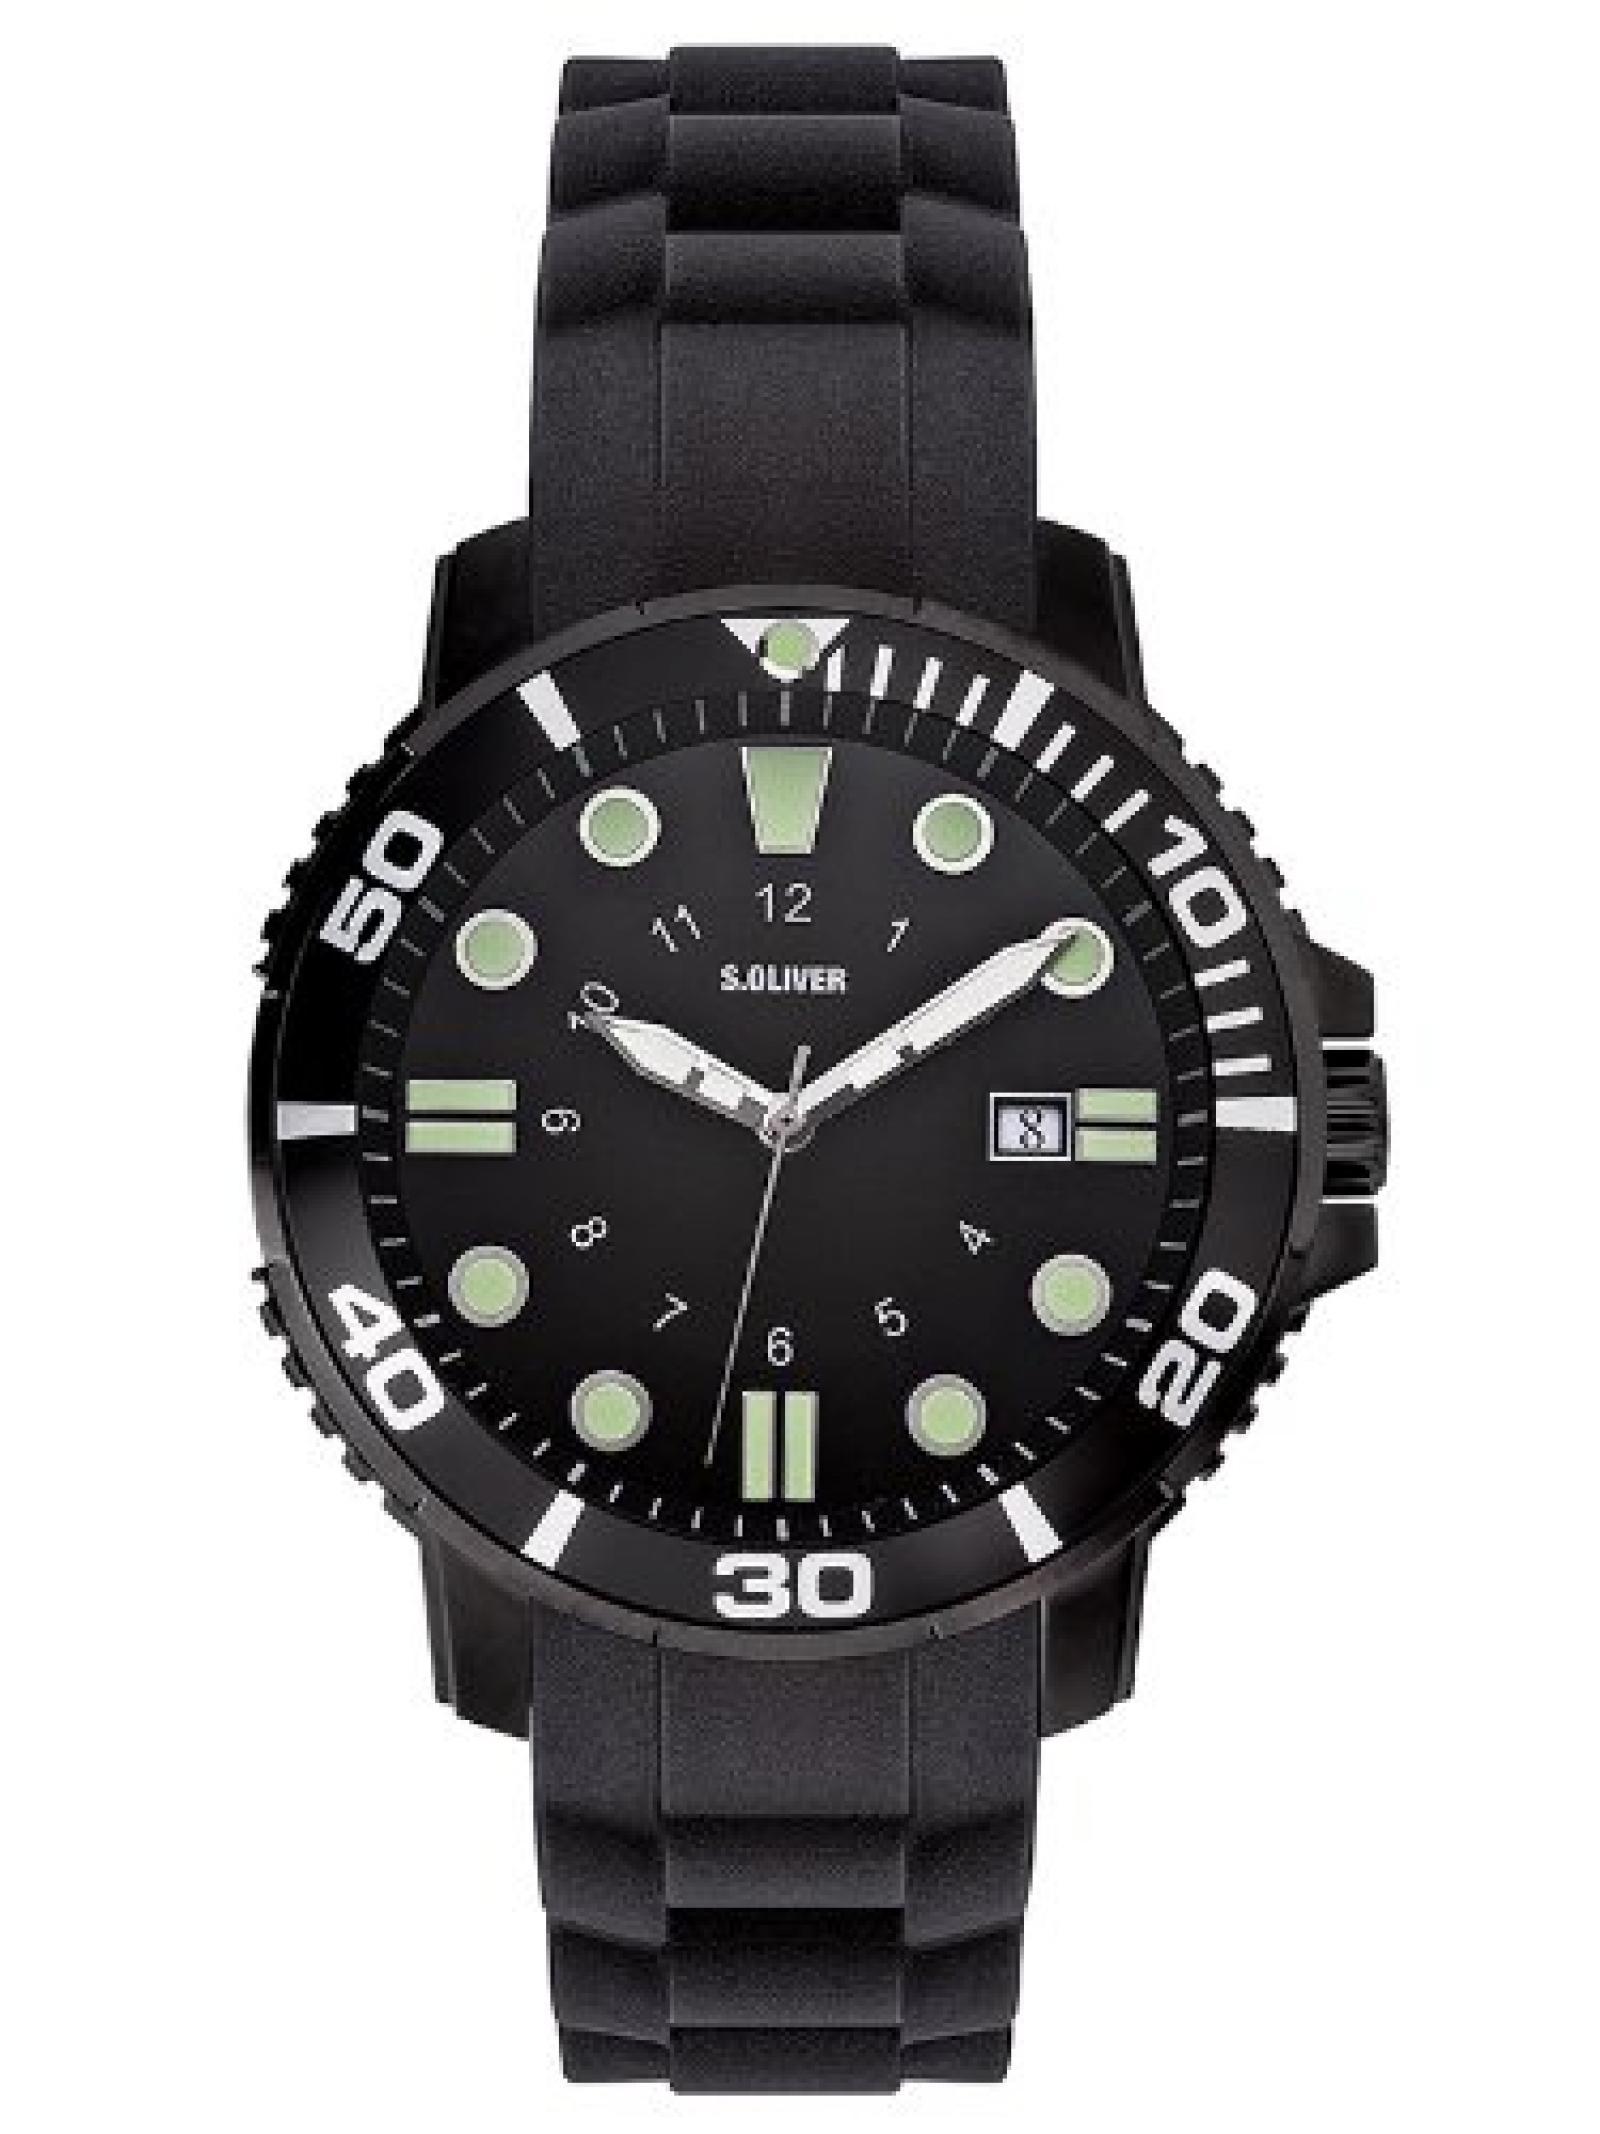 s.Oliver Herren-Armbanduhr XL Analog Quarz Silikon SO-2626-PQ